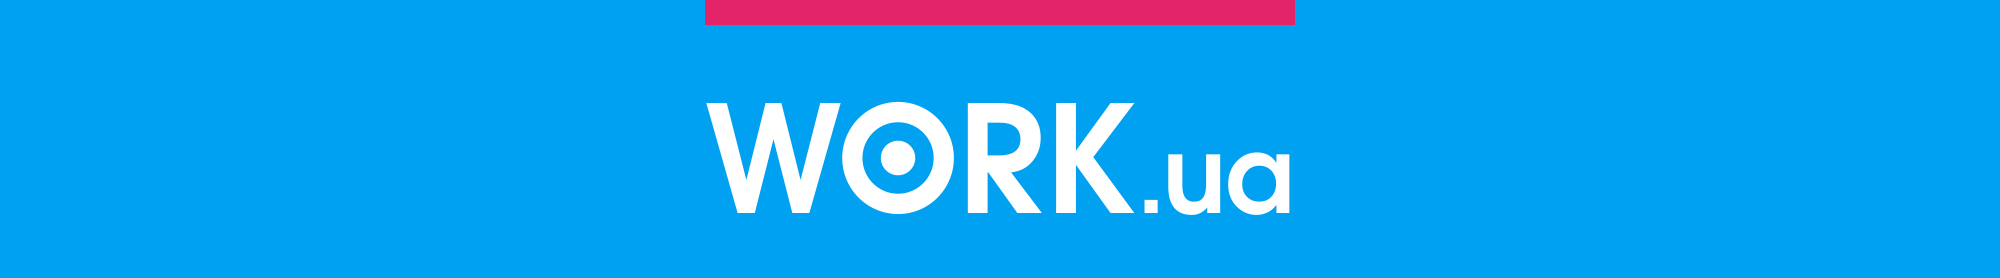 workua-logo